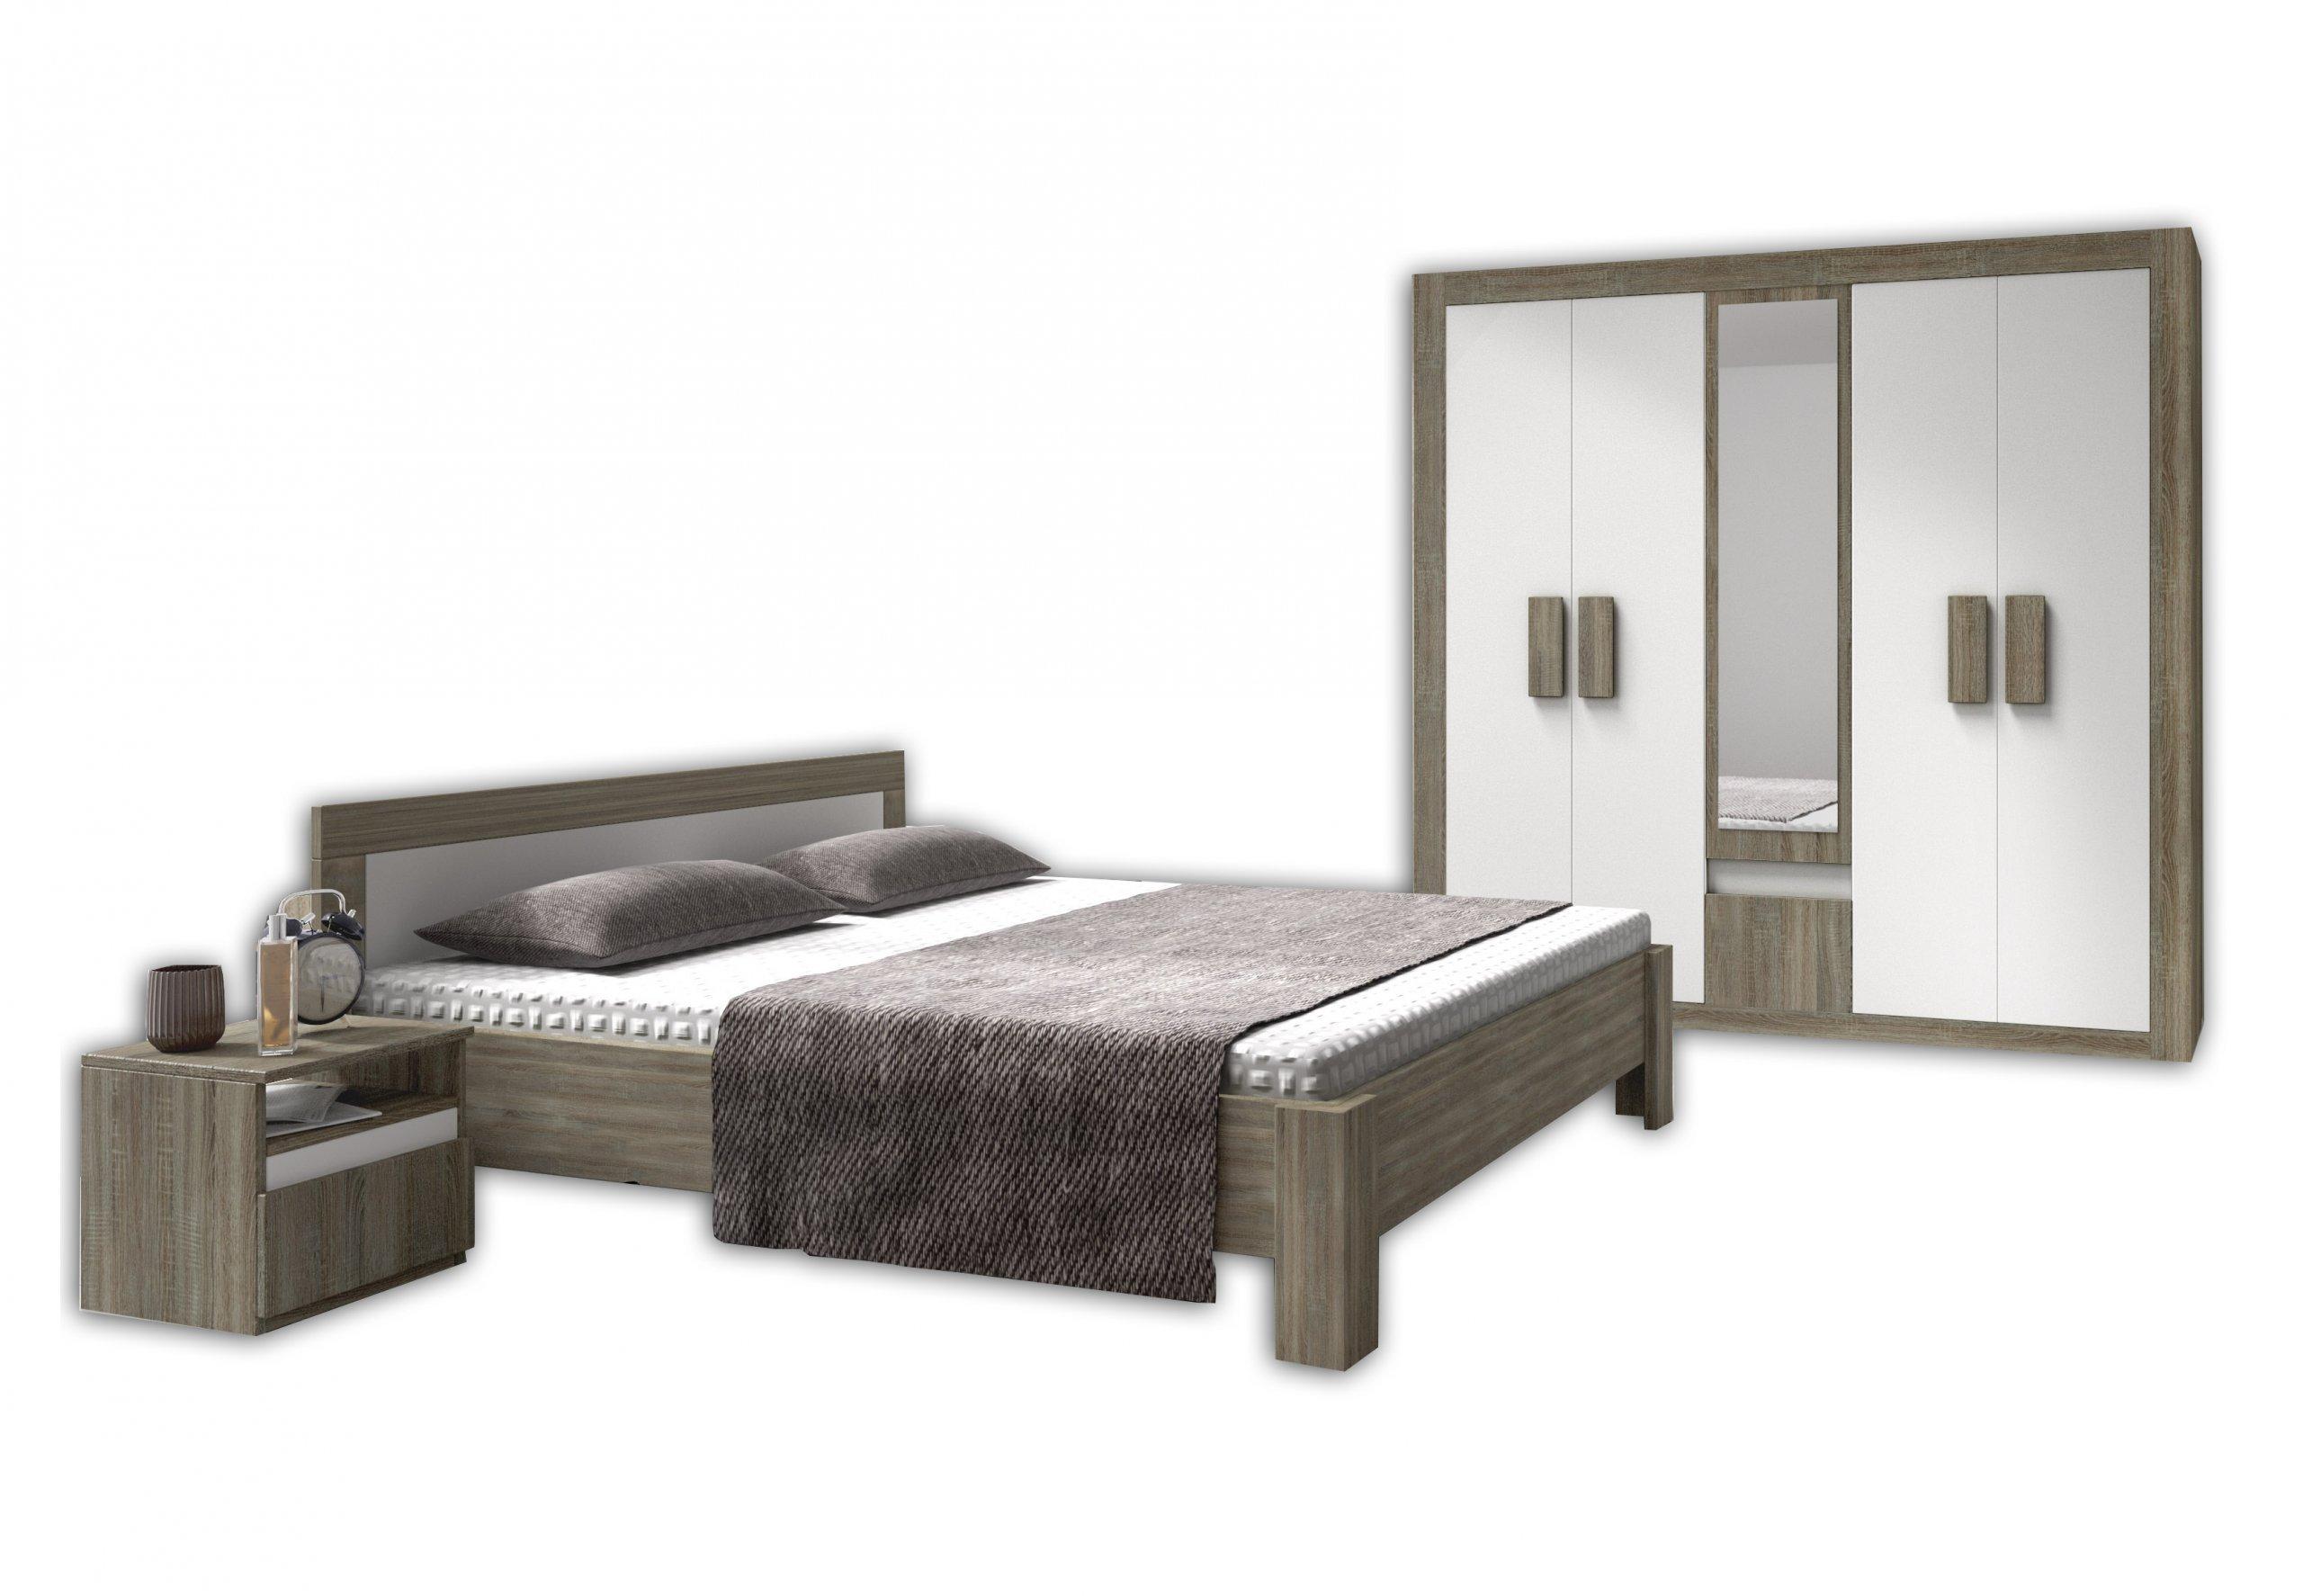 Sypialnia Meble Milano Szafa łóżko 6657494977 Oficjalne